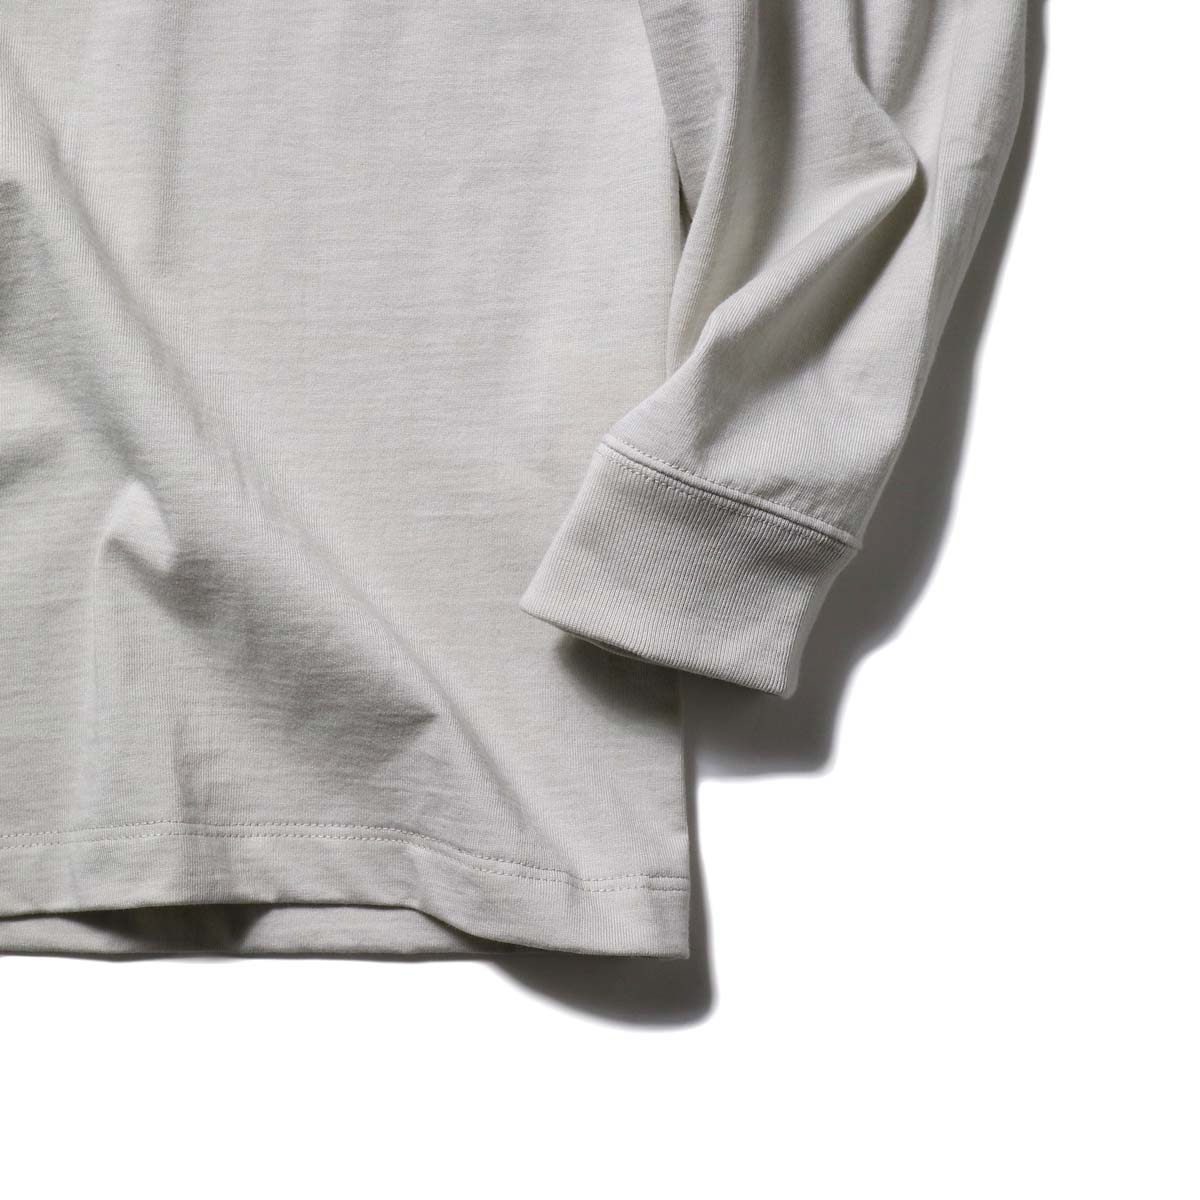 alvana / TANGUIS L/S TEE SHIRTS (Ecru Gray)袖、裾